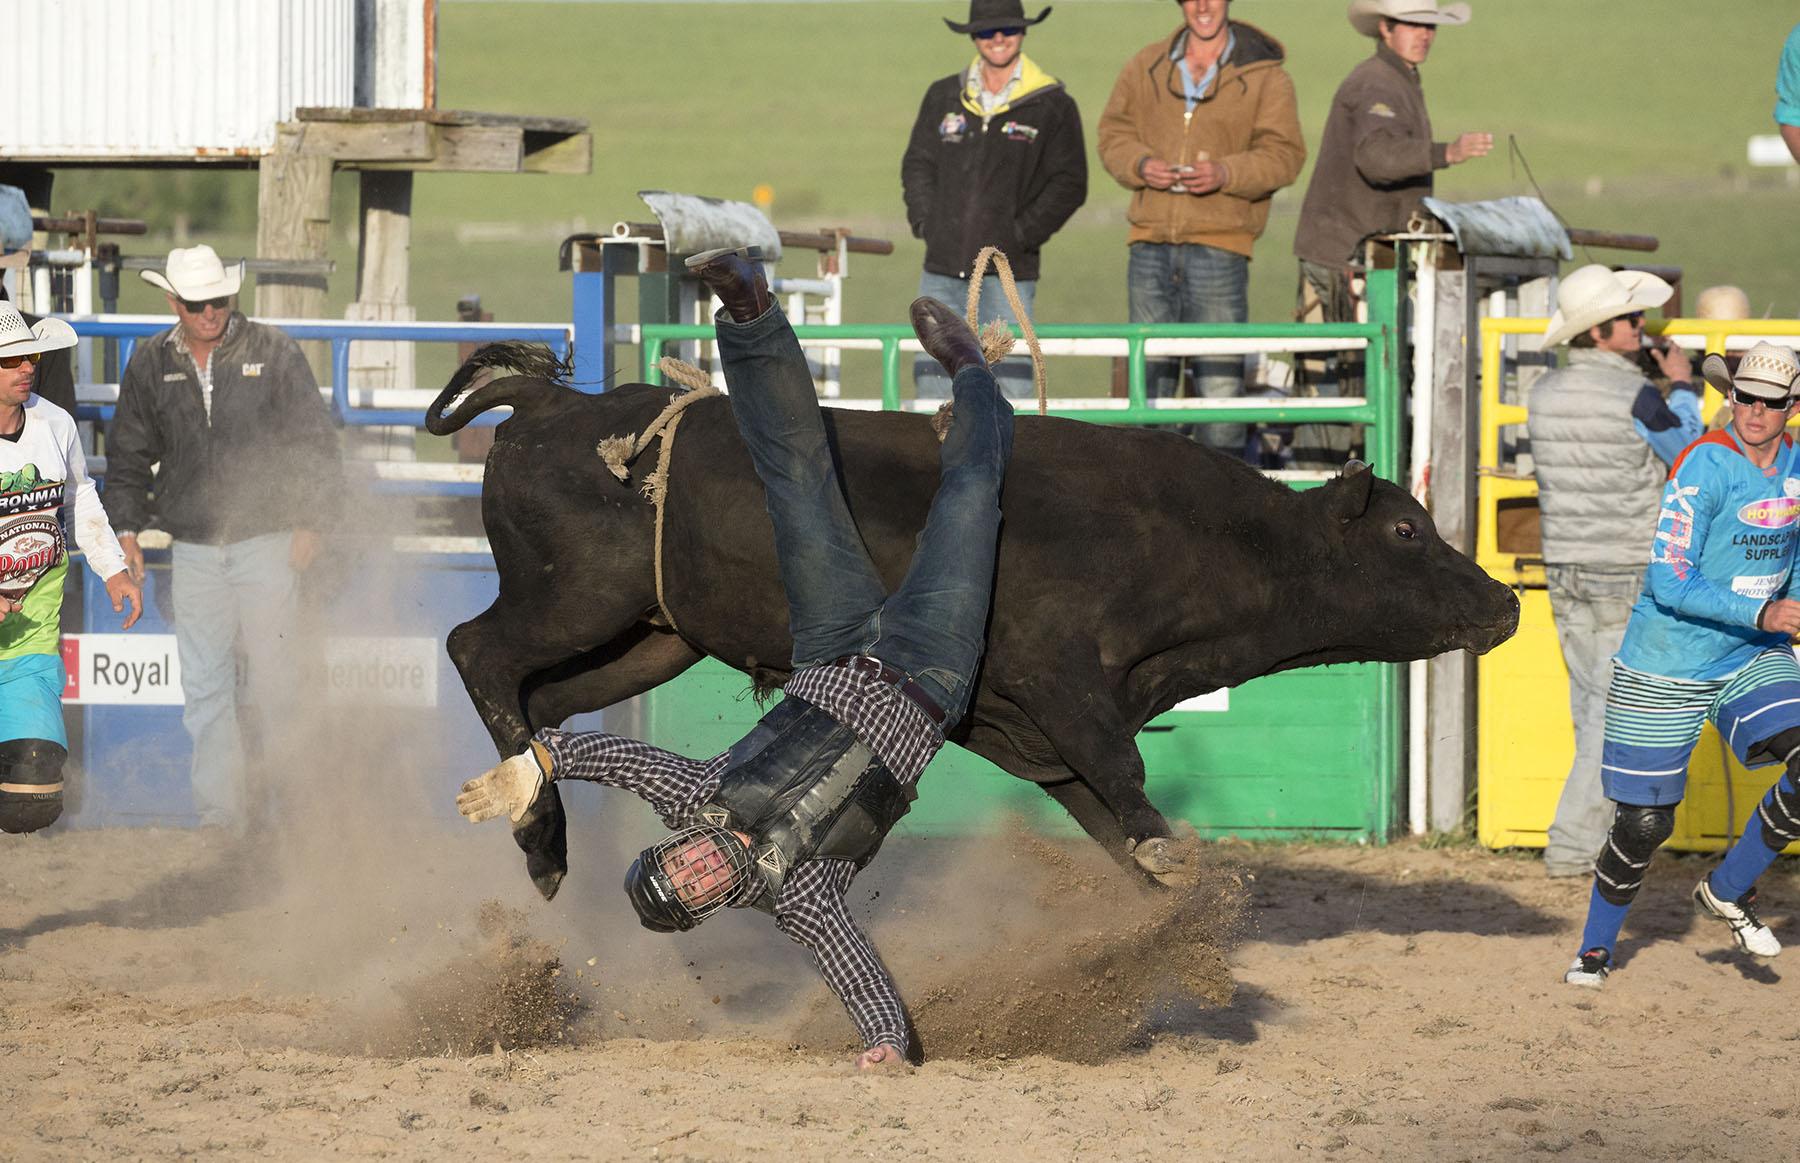 BrianJones_Rodeo Bull Riding_Bull Riding 3.jpg